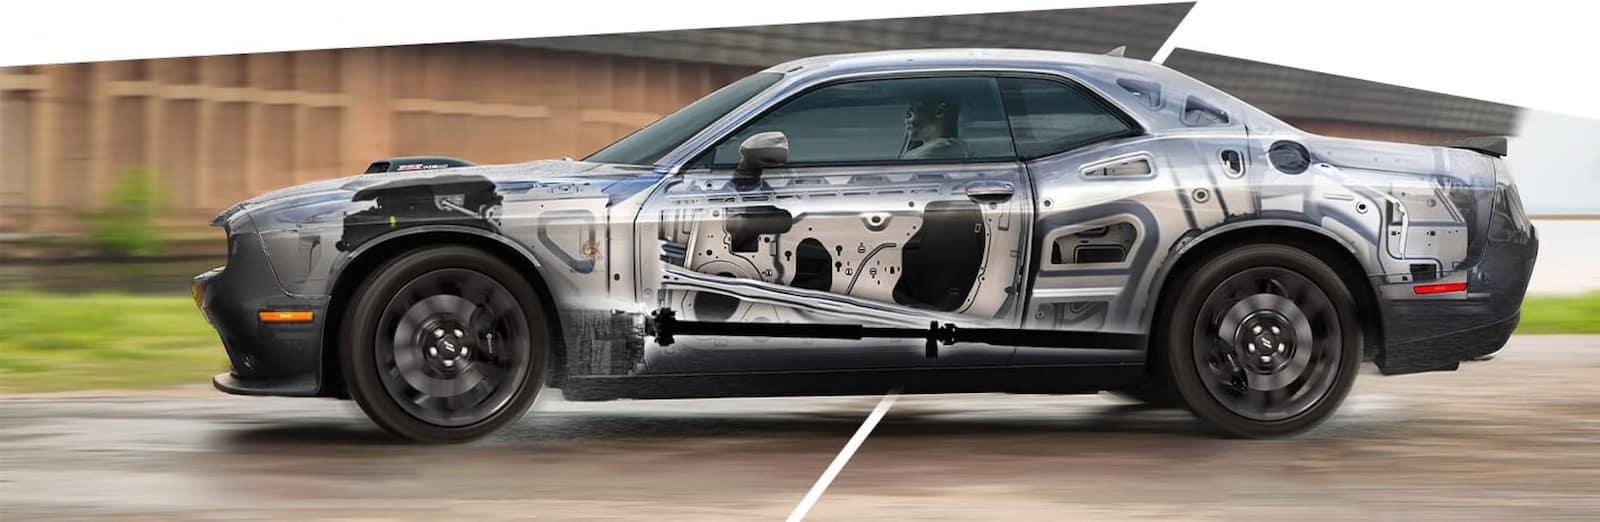 2021 Dodge Challenger body structure